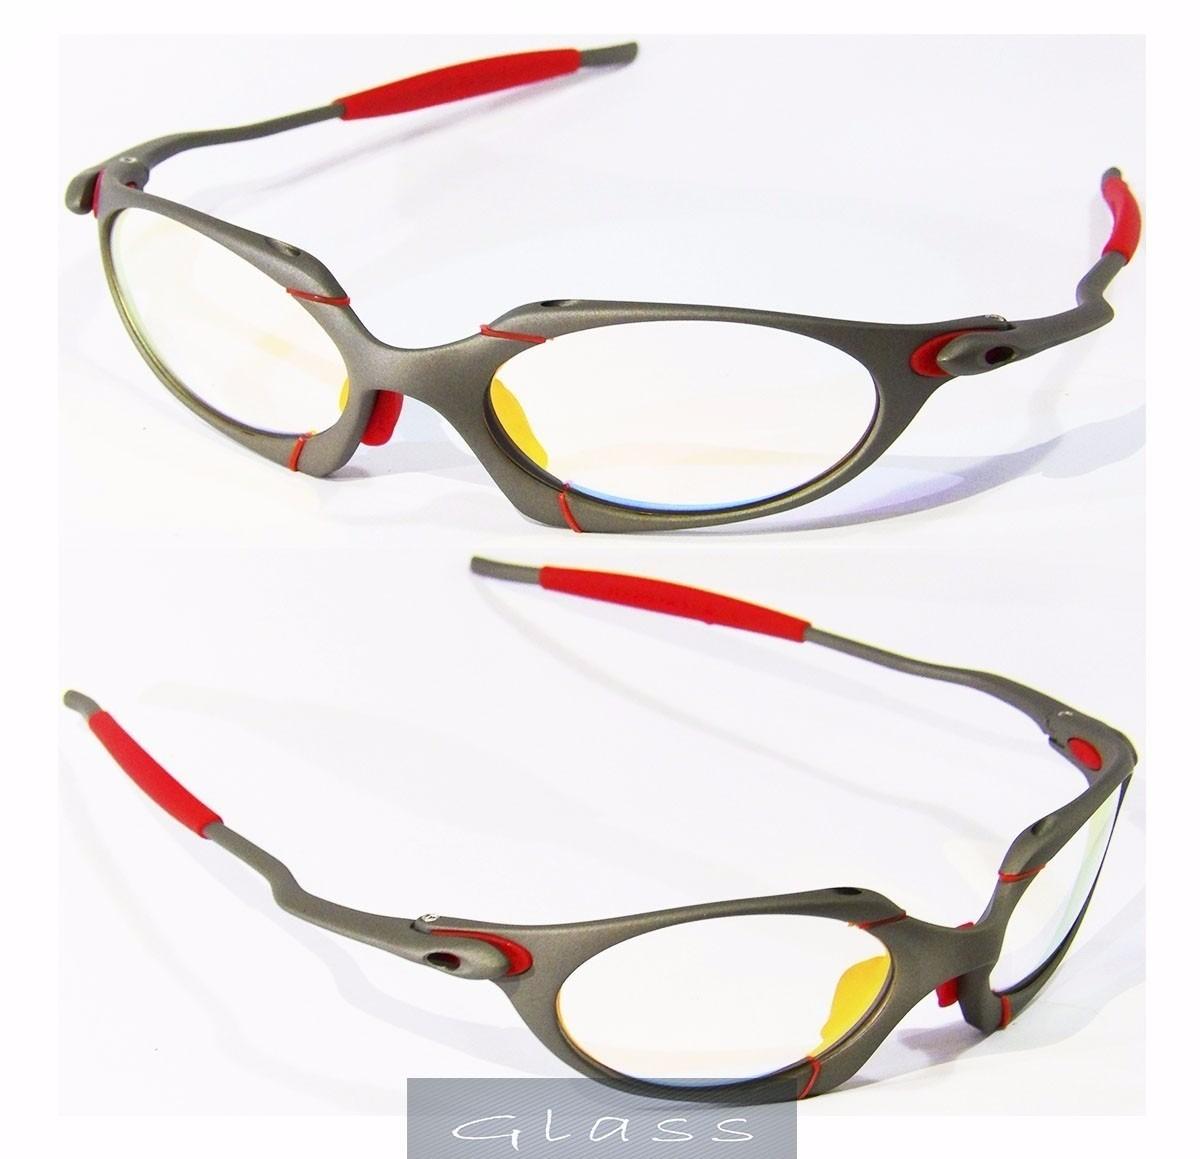 caa3a087a Oculos Oakley Juliet Melhor Pre%C3%A7o